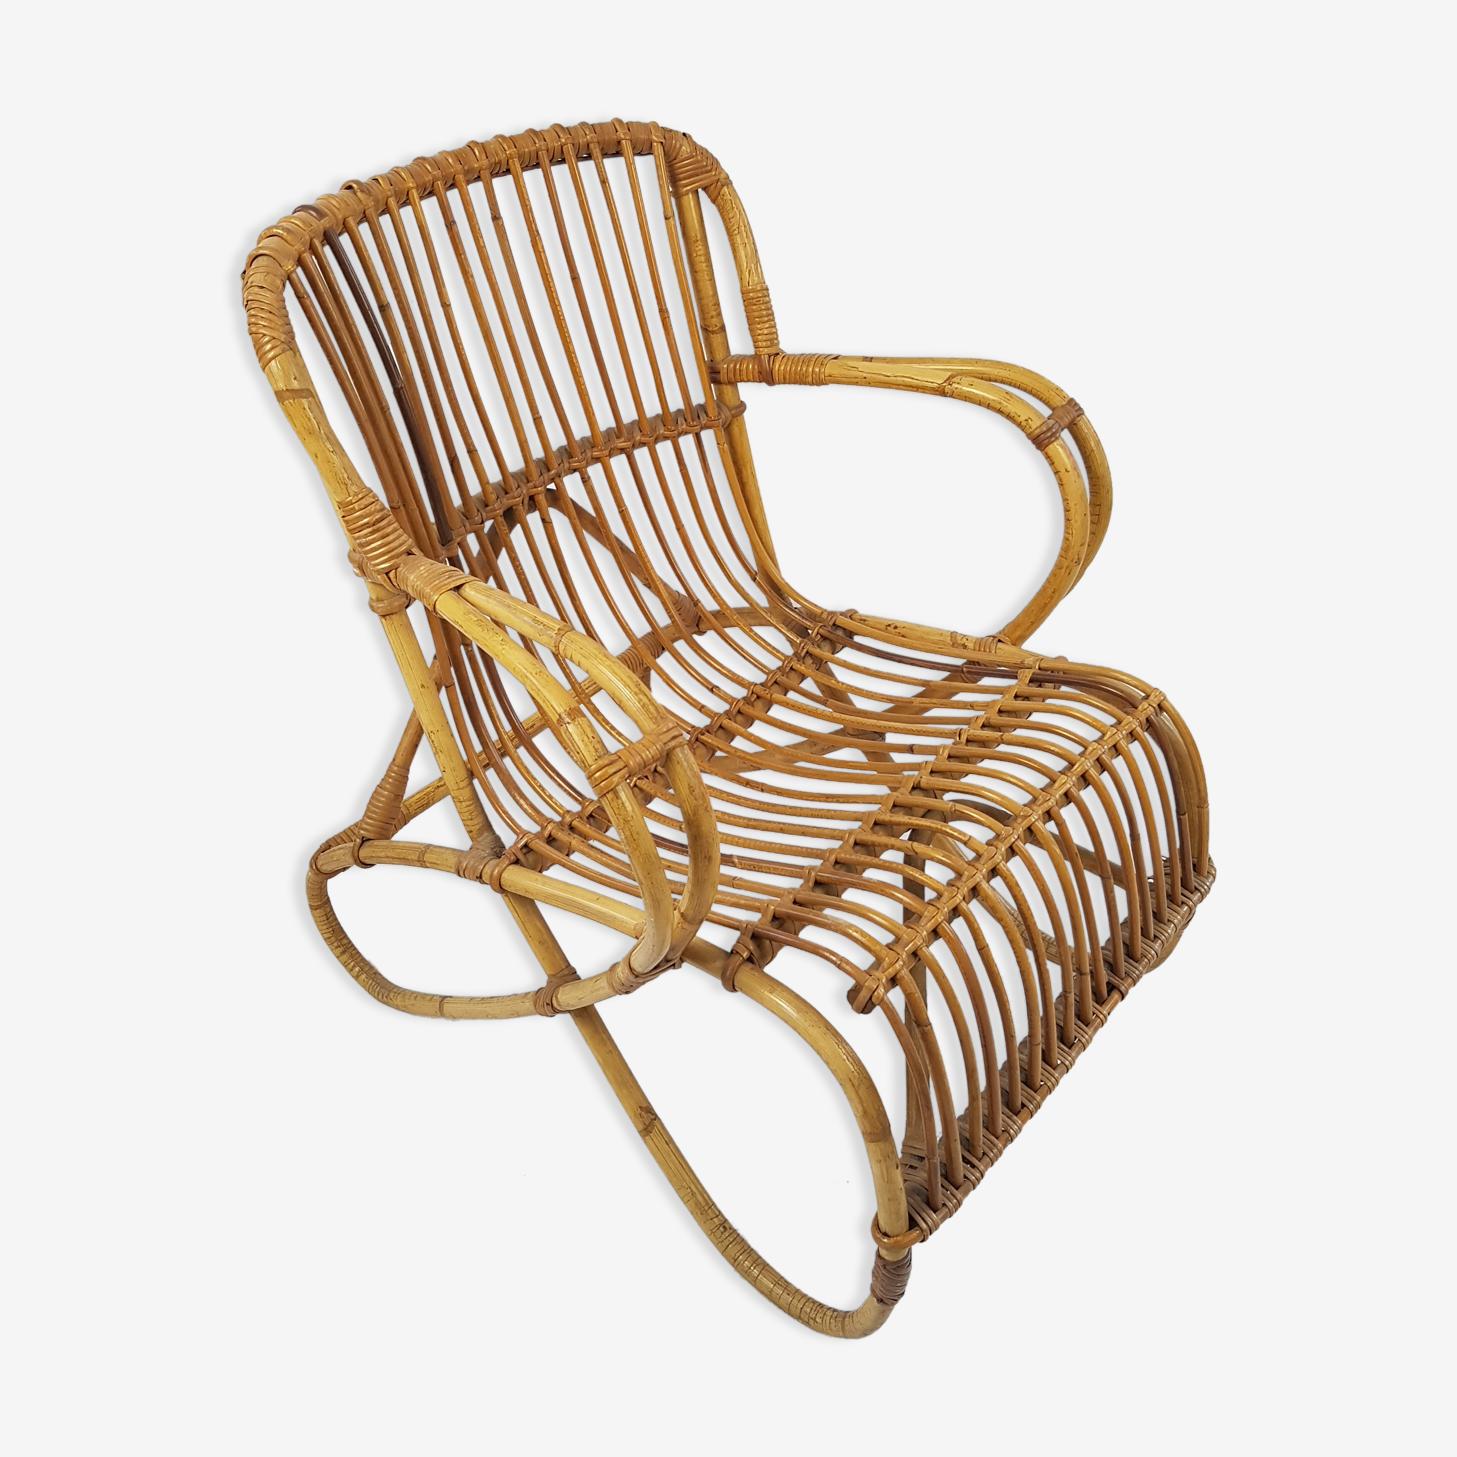 Vintage curved feet rattan chair